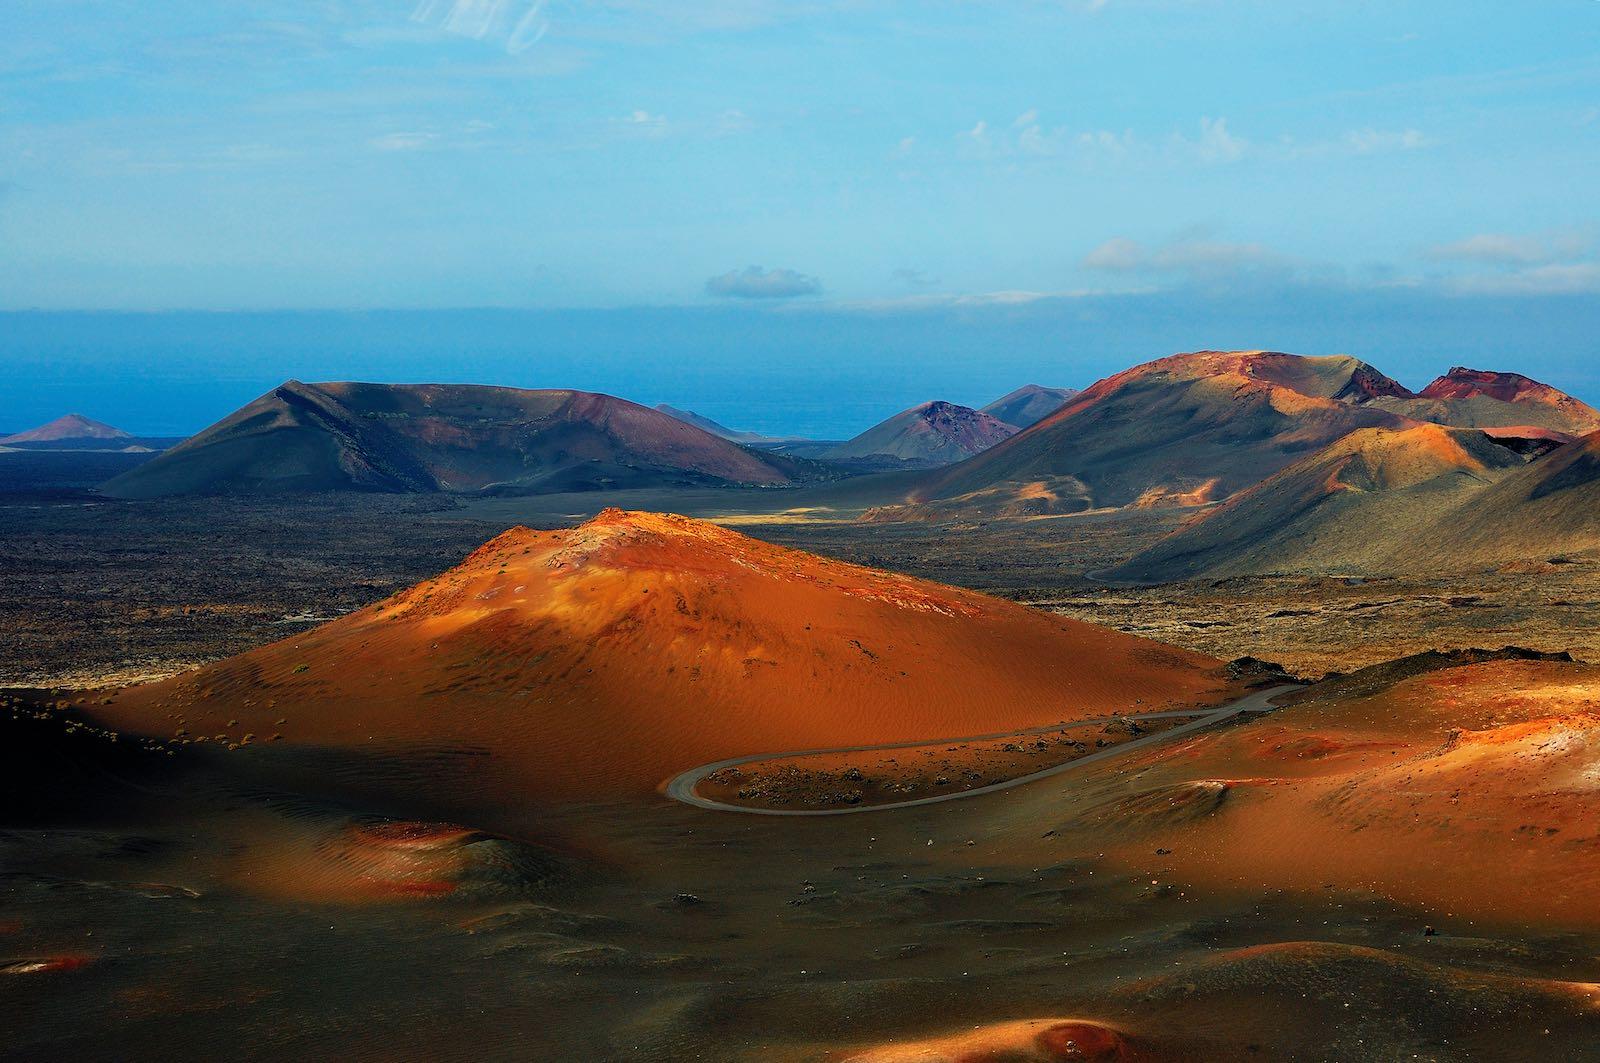 istock_Lanzarote_National Park Timanfaya-min